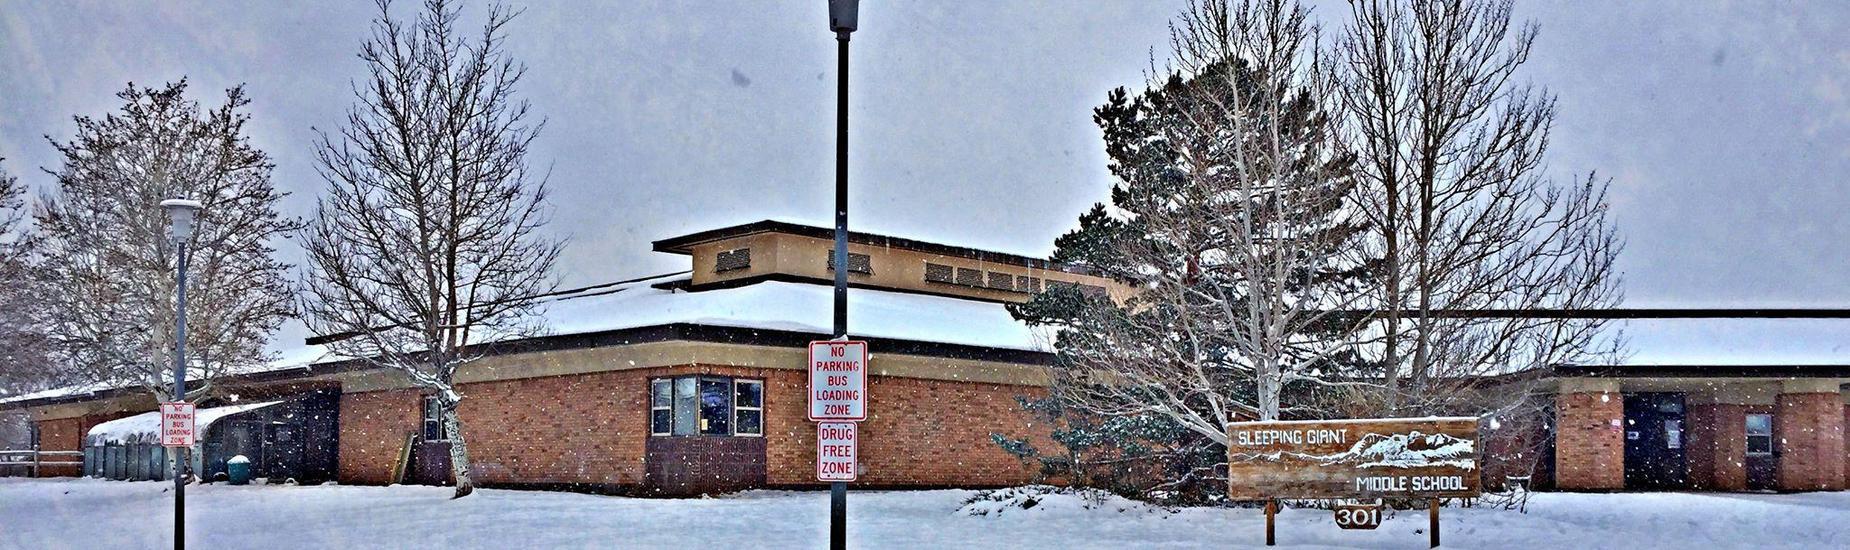 Entrance of Sleeping Giant Middle School